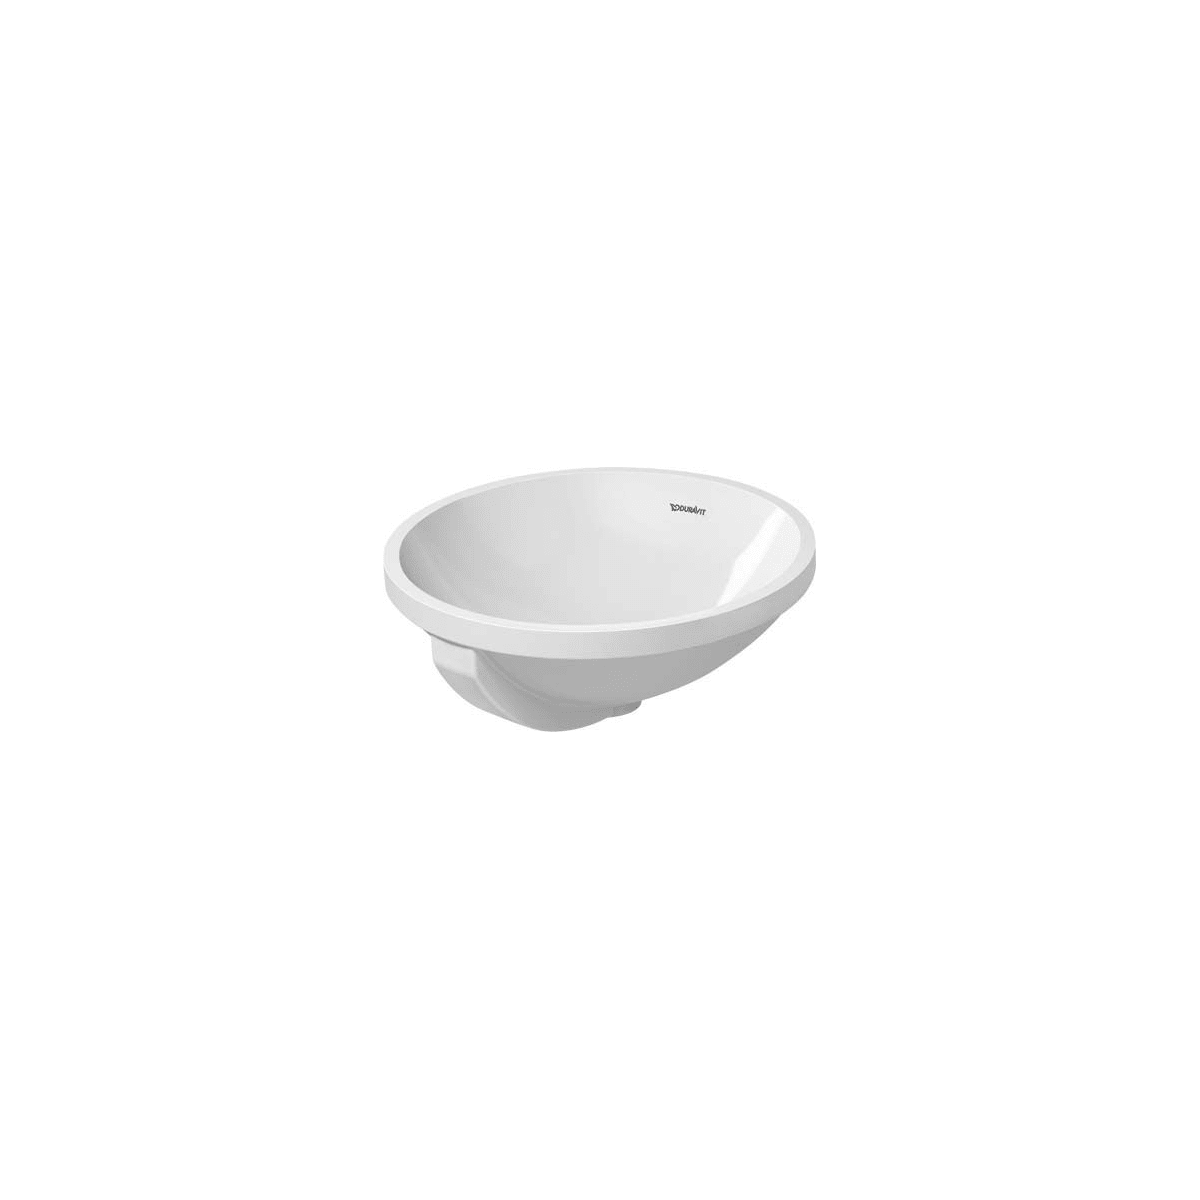 Duravit 04684000001 White With Wondergliss Glazed Underside Architec 15 3 4 Circular Ceramic Undermount Bathroom Sink With Overflow Faucet Com